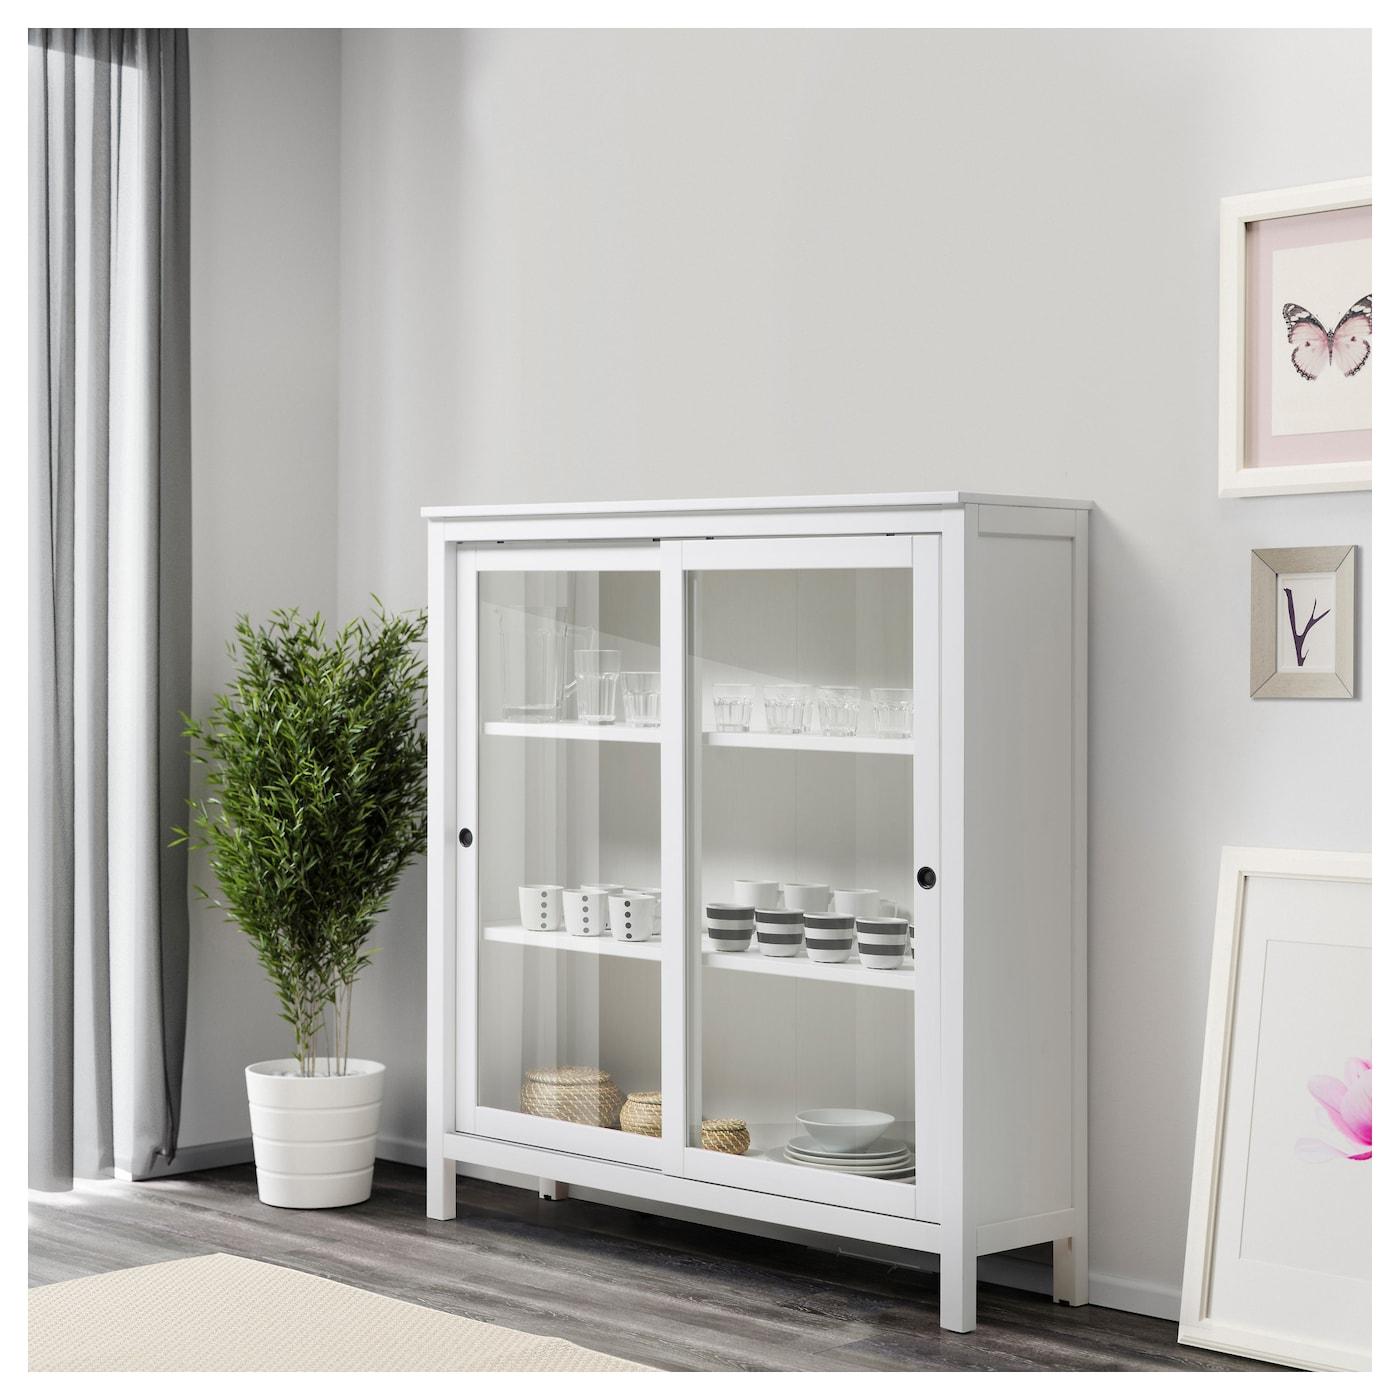 Hemnes Vitrine Teint Blanc 120×130 Cm Ikea # Vitrines Murales Ikea